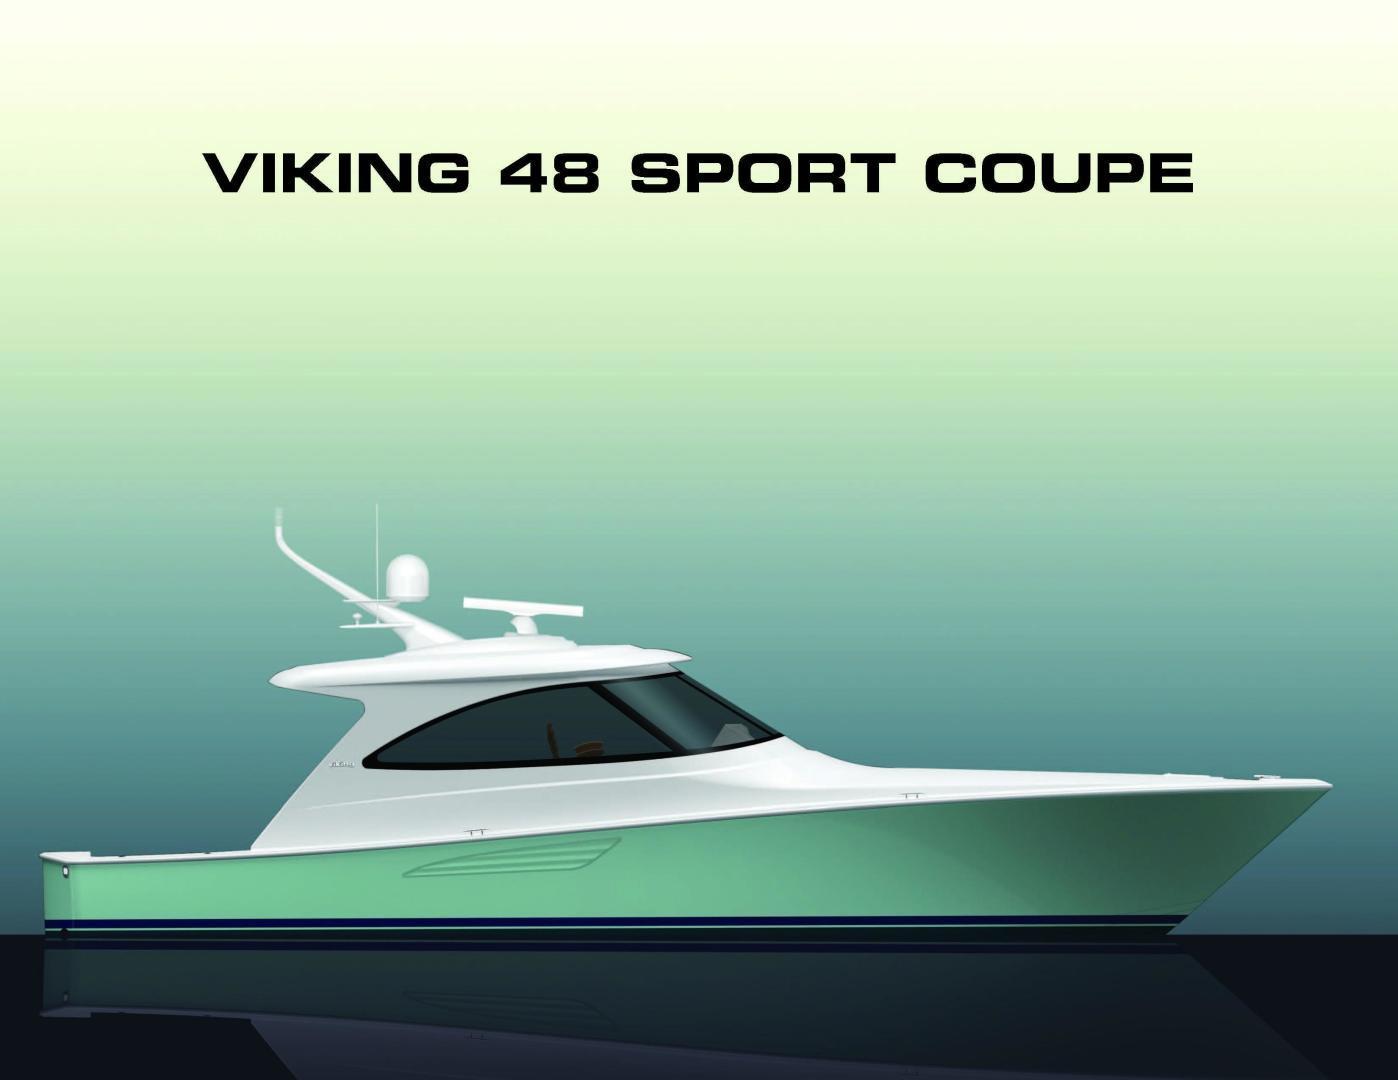 Viking 48 - Sport Coupe - Exterior Profile